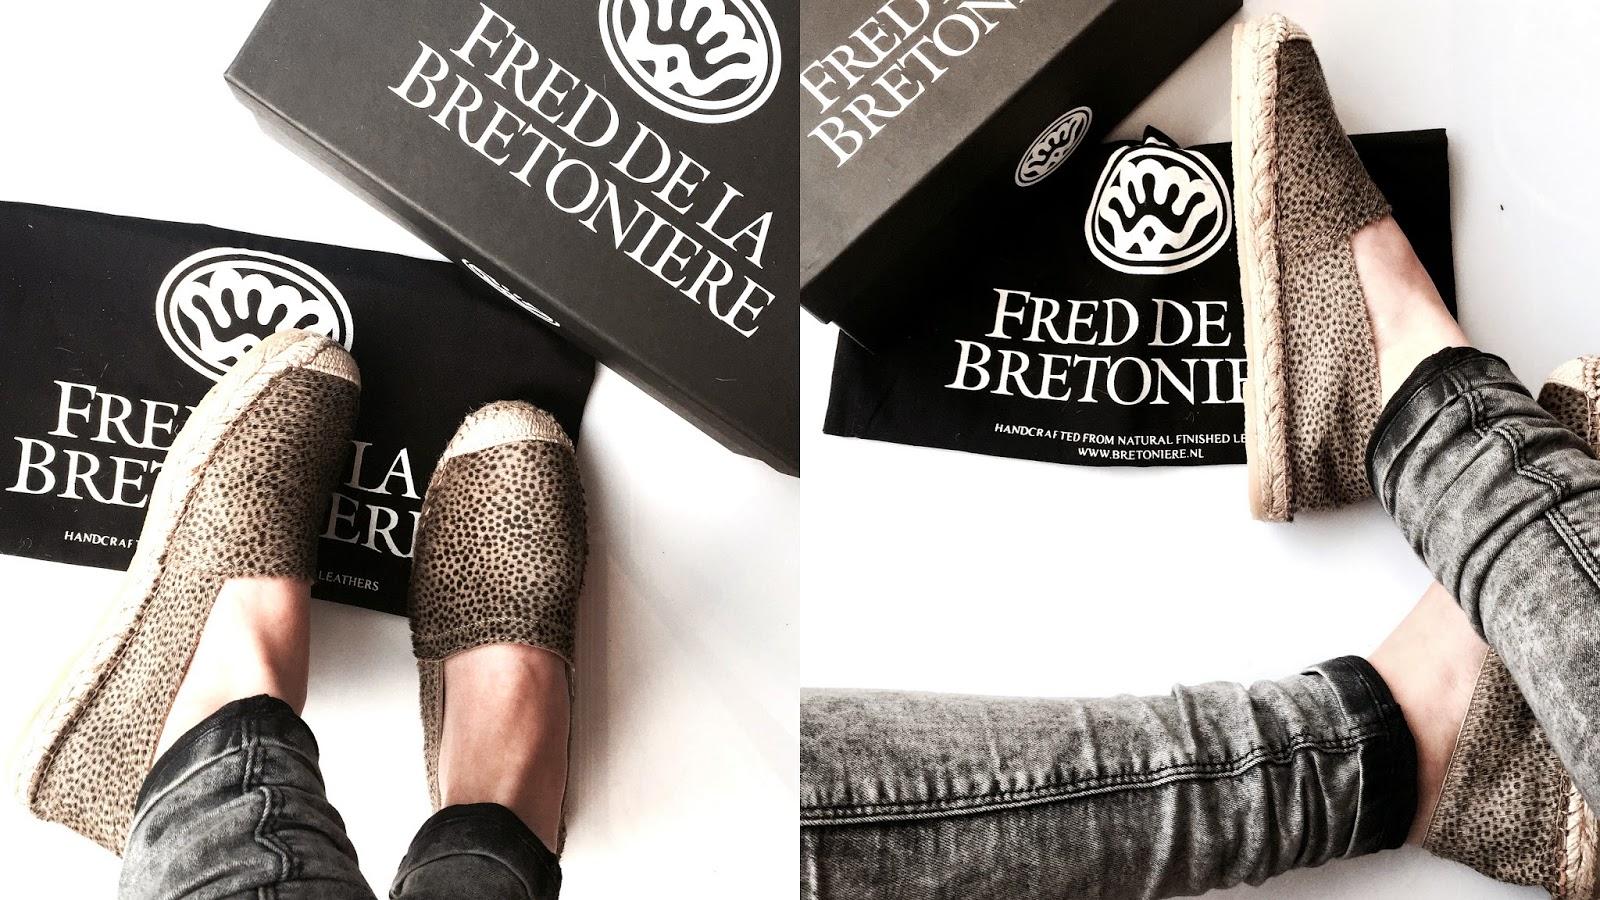 FredDeLaBretoniere Instagram posts